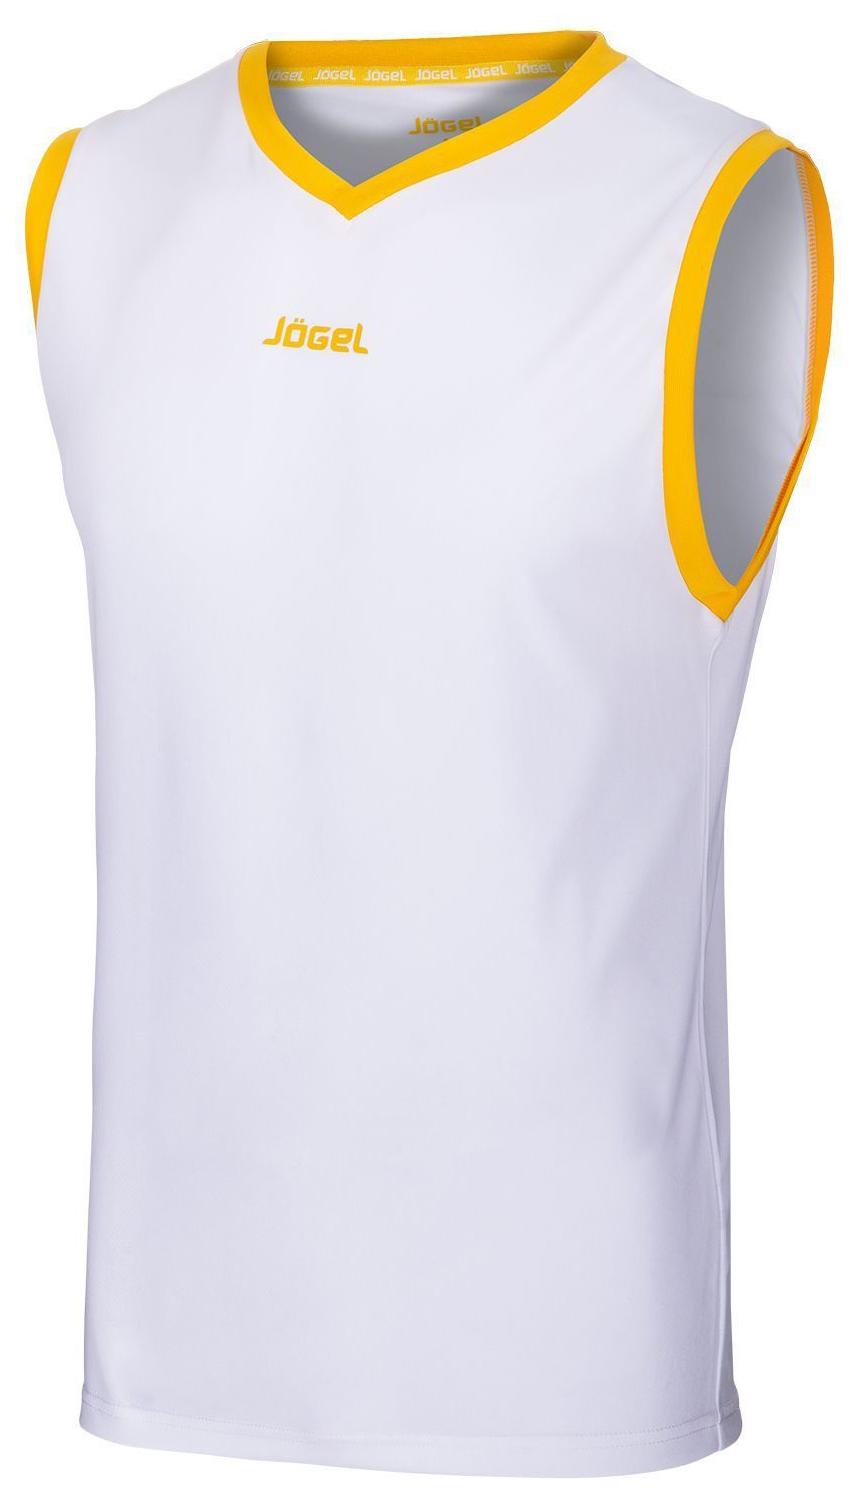 Майка баскетбольная JBT 1020 014, белый/желтый, детская